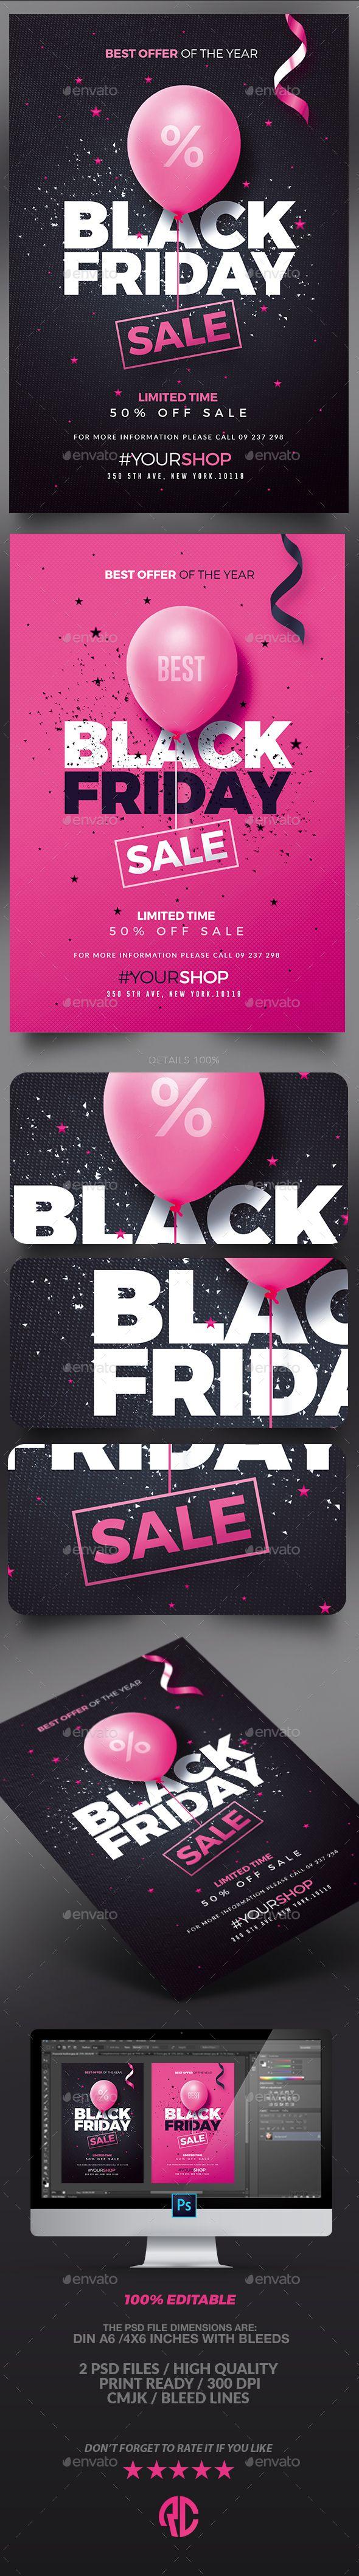 Black Friday | Flyer Template PSD | Poster ideas | Pinterest ...